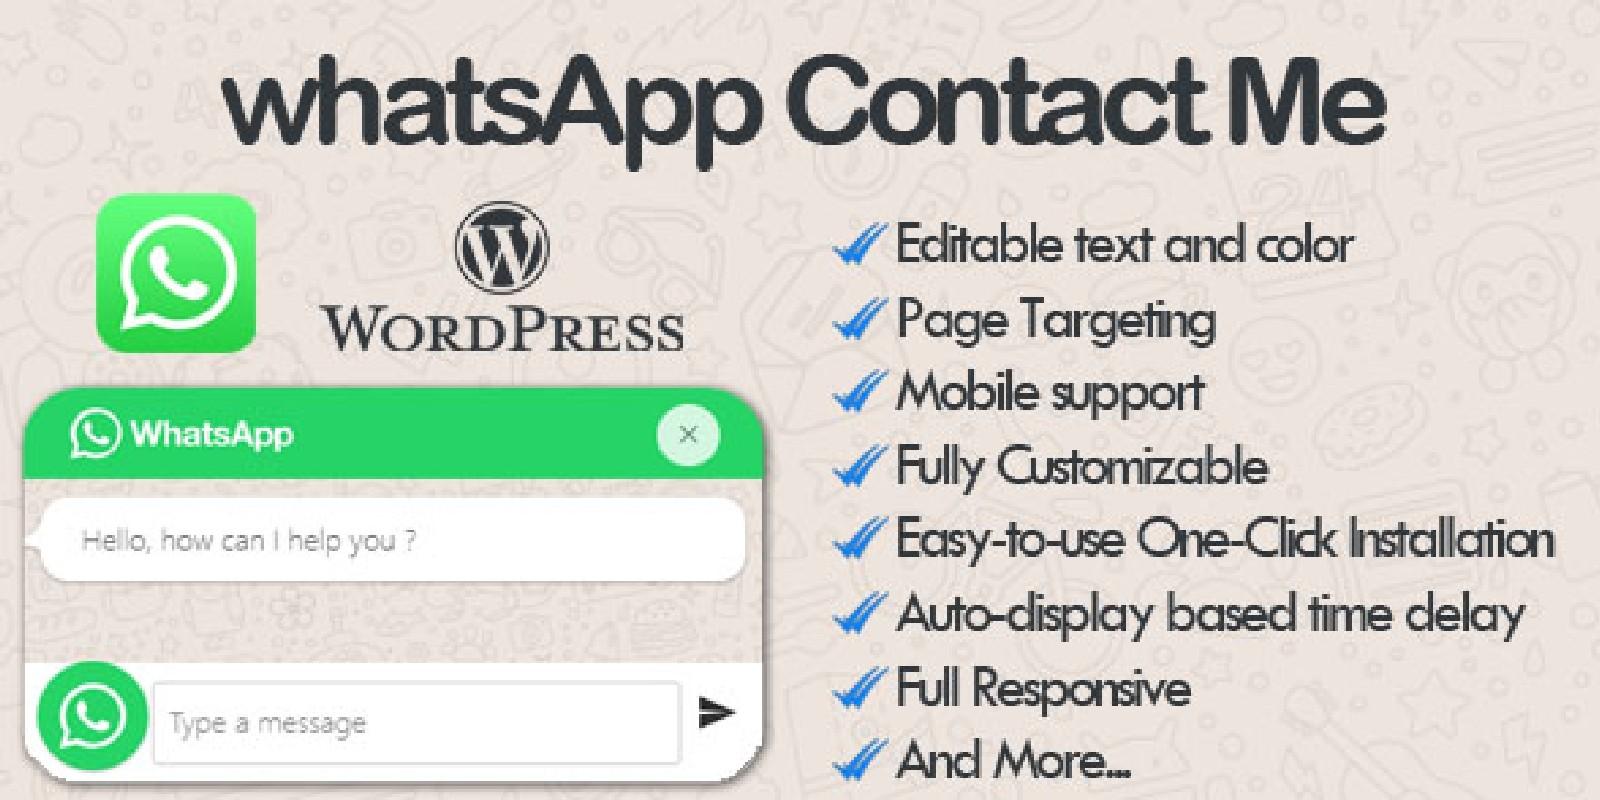 WhatsApp Contact Me - WhatsApp Chat WordPress